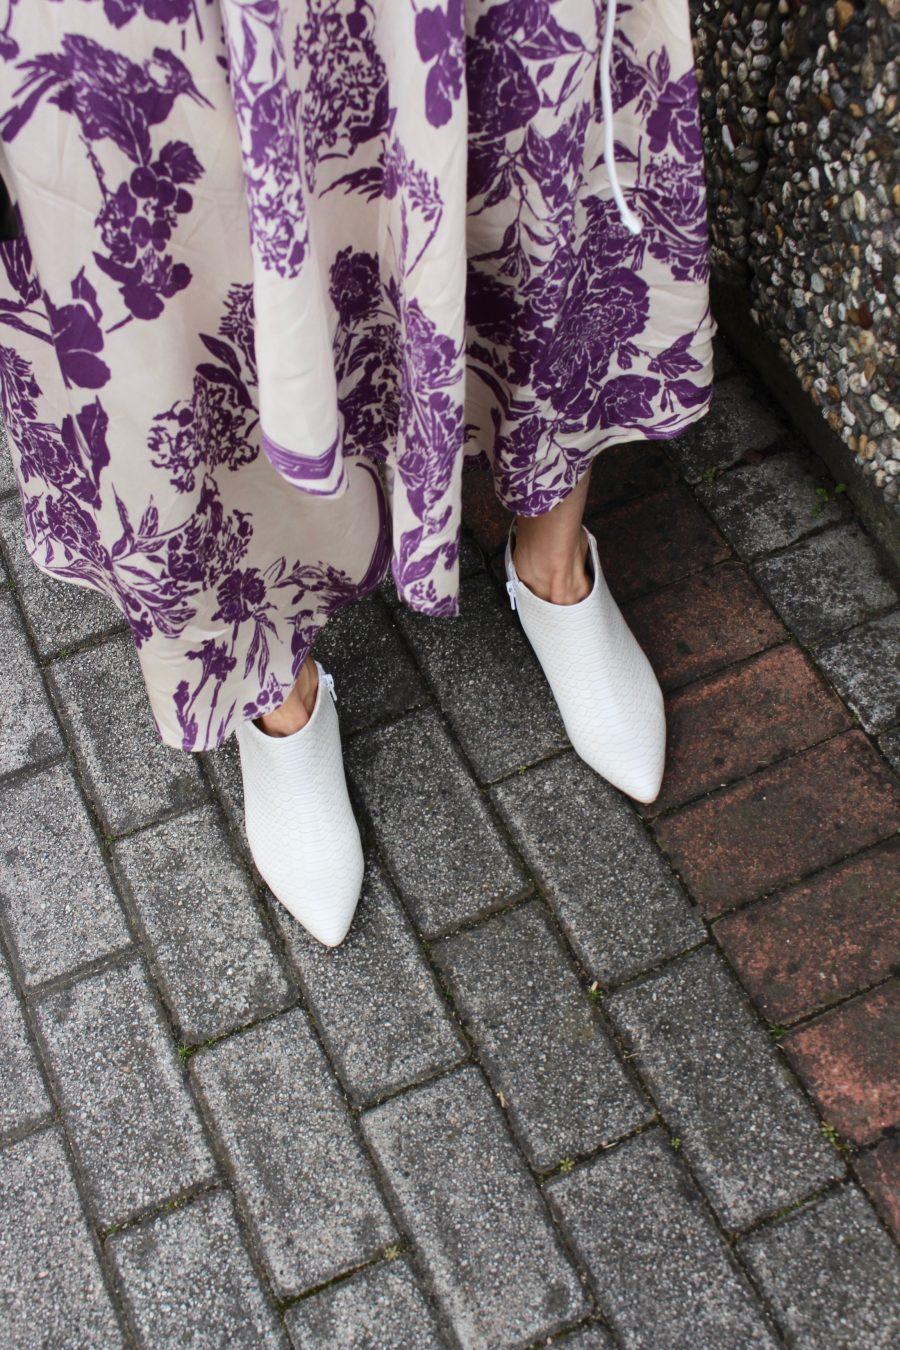 H&M trend Rock blumig summer 2018